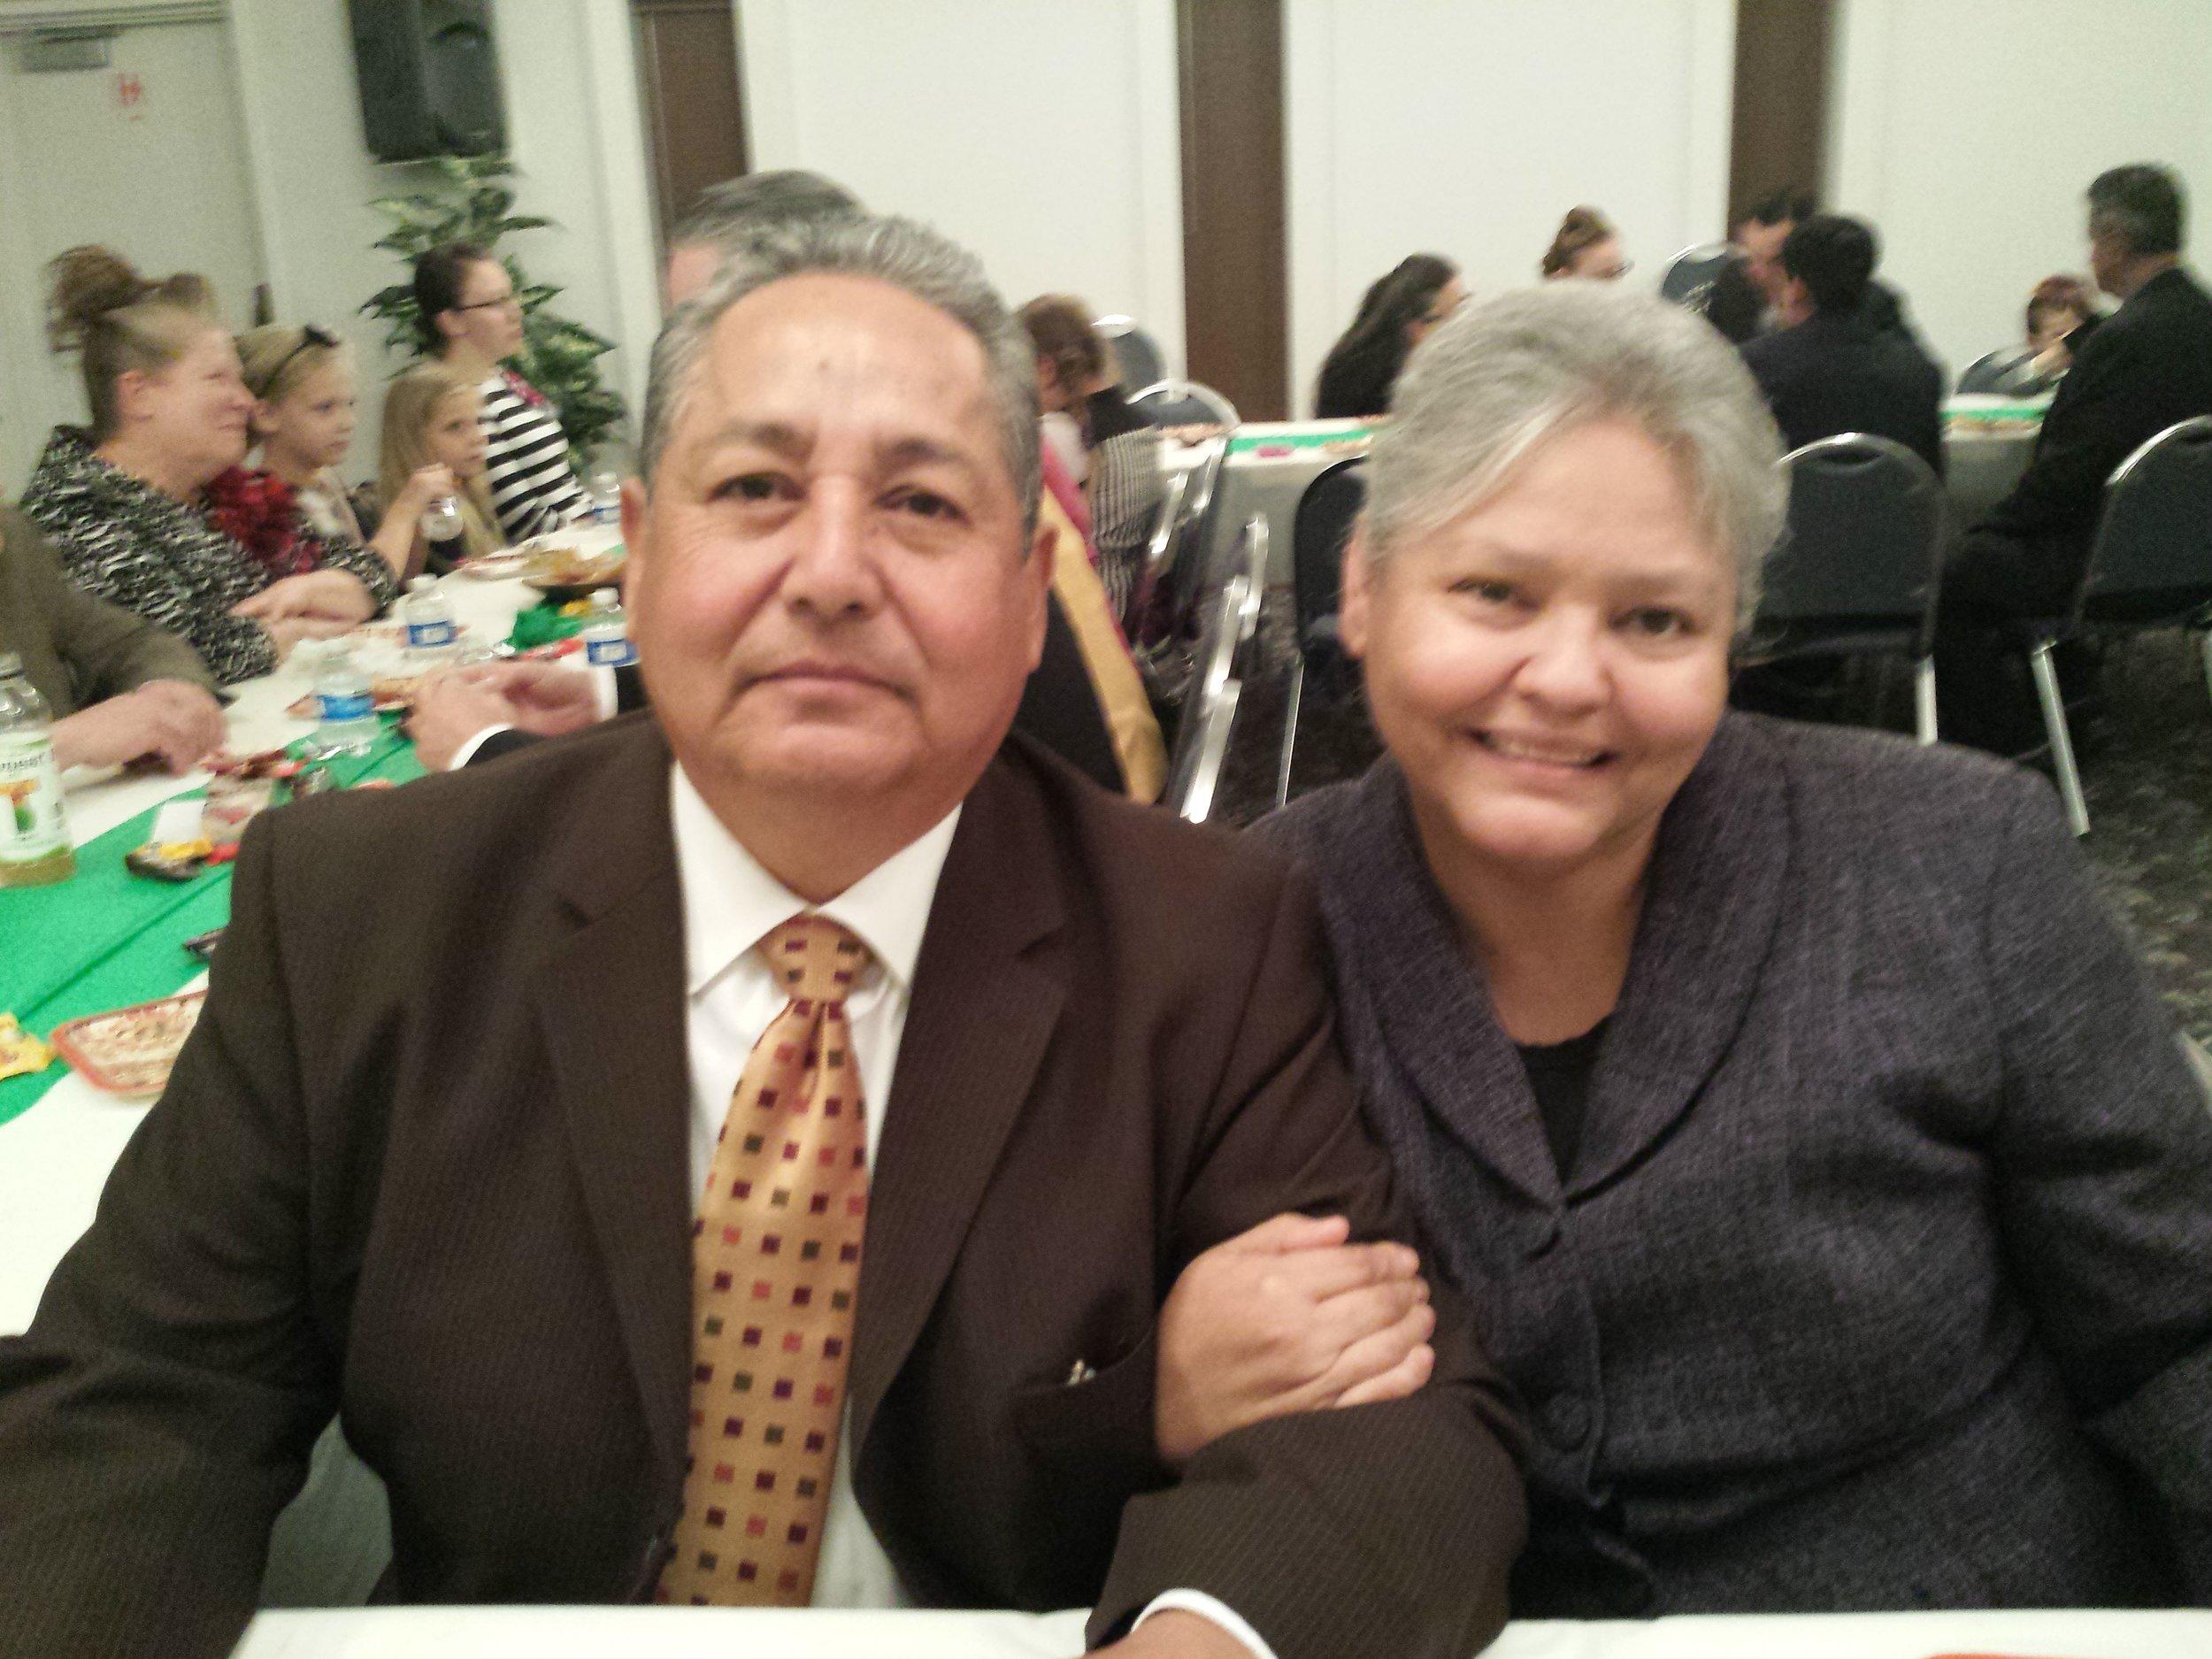 Bro. and Sis. Nevarez